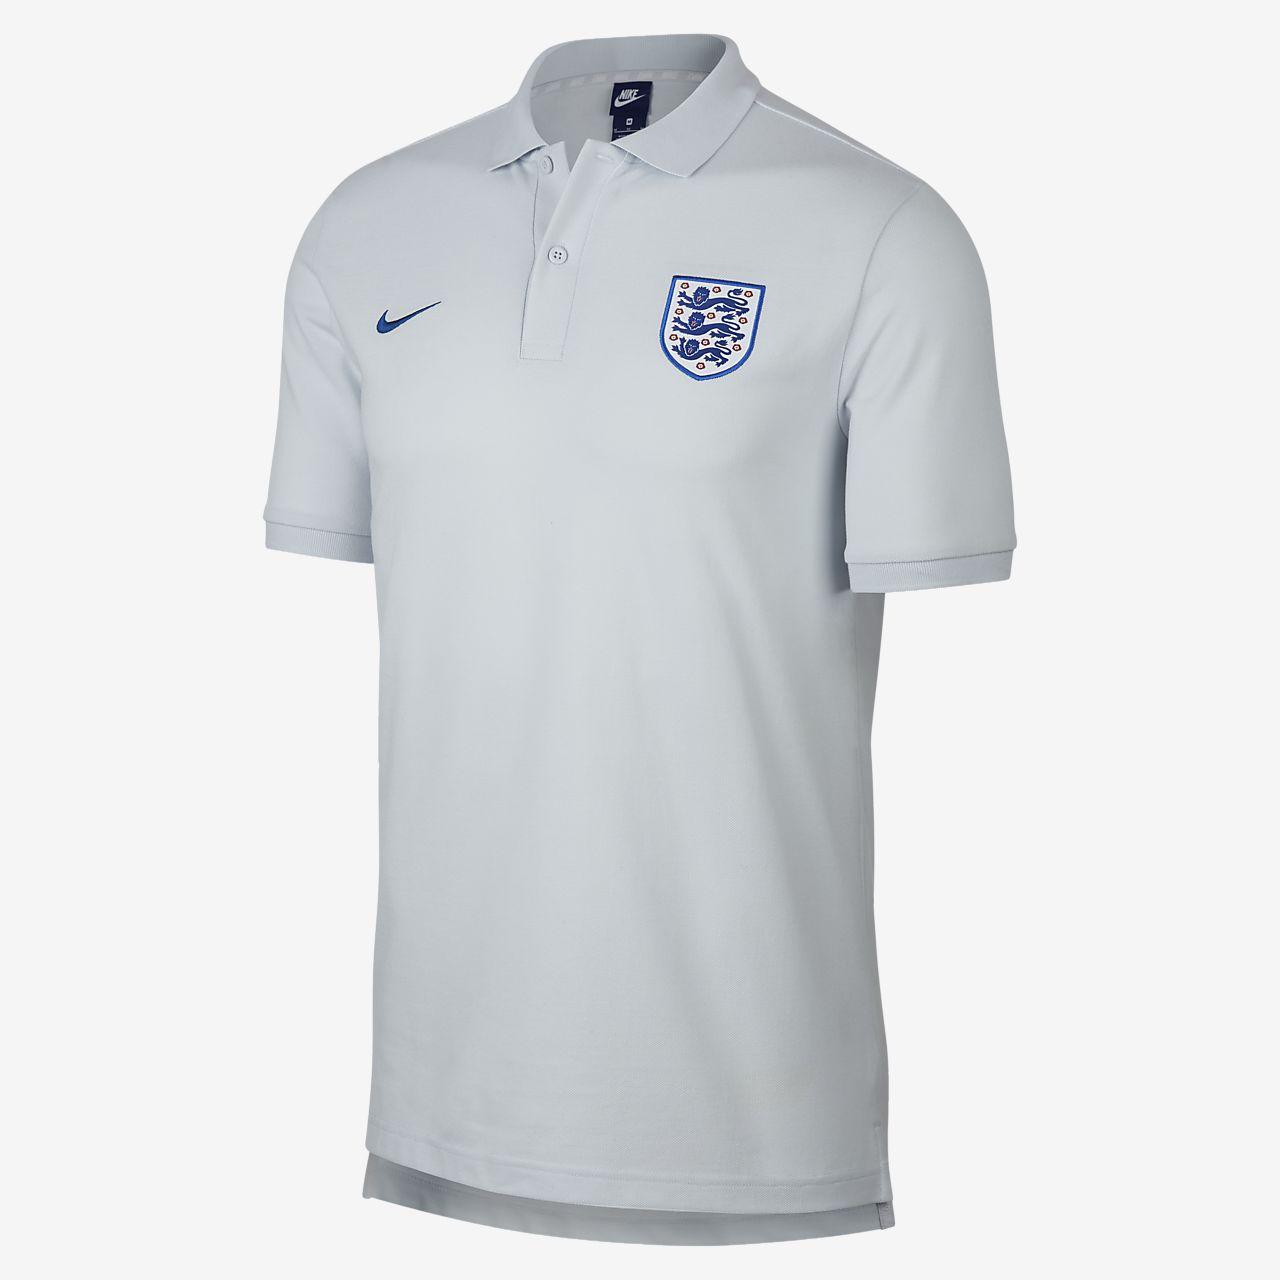 Pikétröja England för män